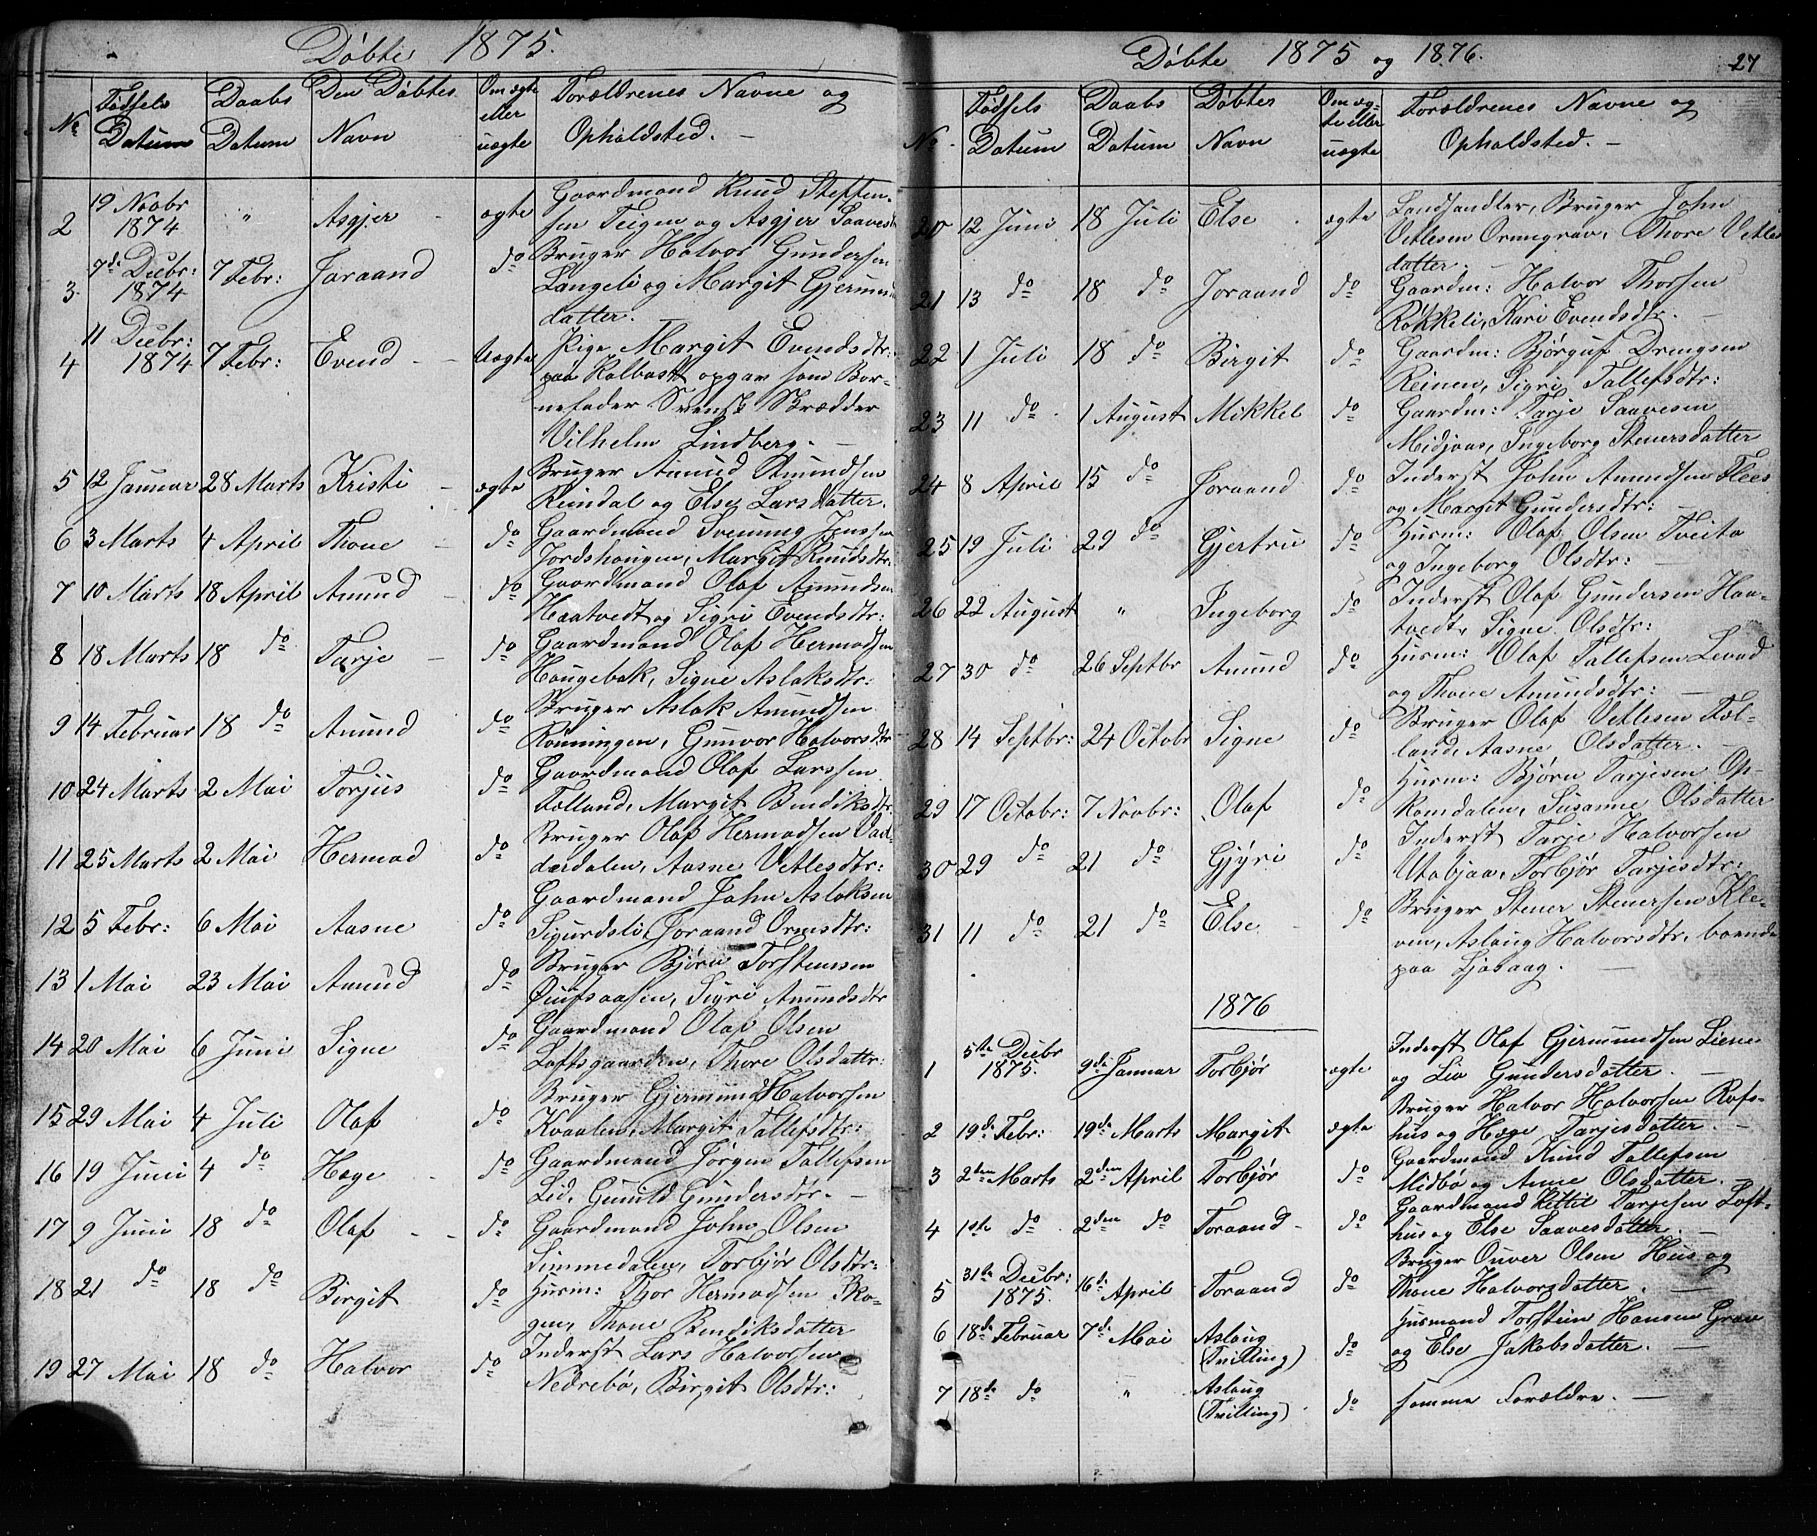 SAKO, Mo kirkebøker, G/Ga/L0001: Klokkerbok nr. I 1, 1851-1891, s. 27